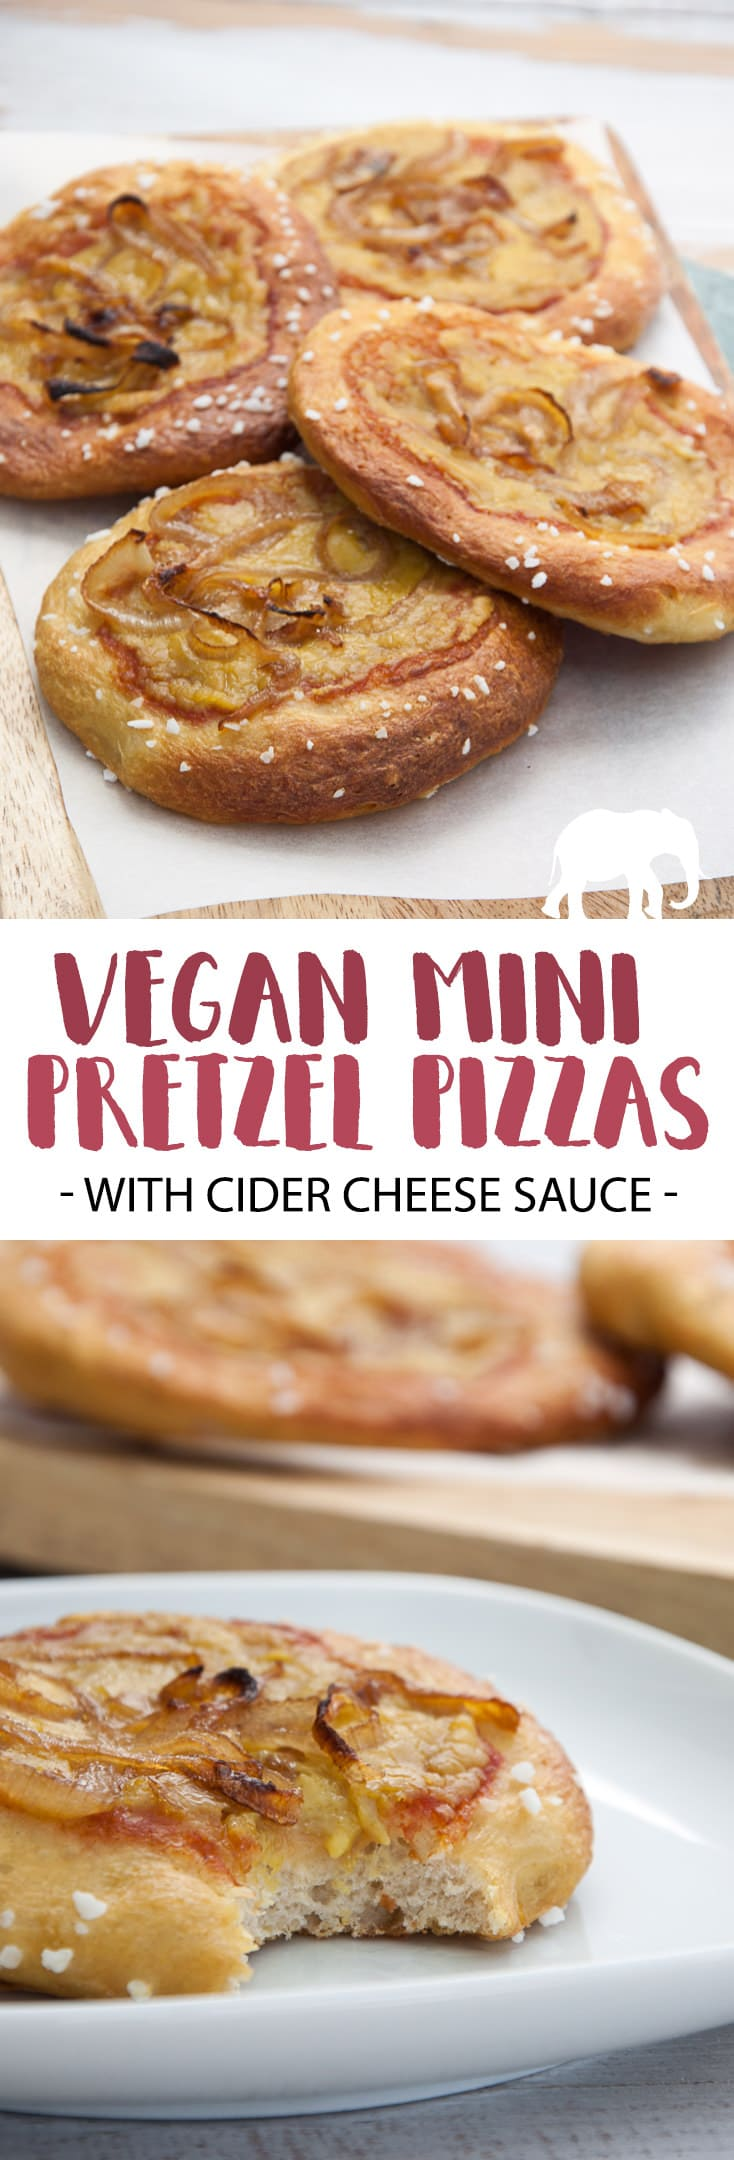 Vegan Mini Pretzel Pizzas with Cider Cheese Sauce #vegan #pretzel #pizza #cider #cheese